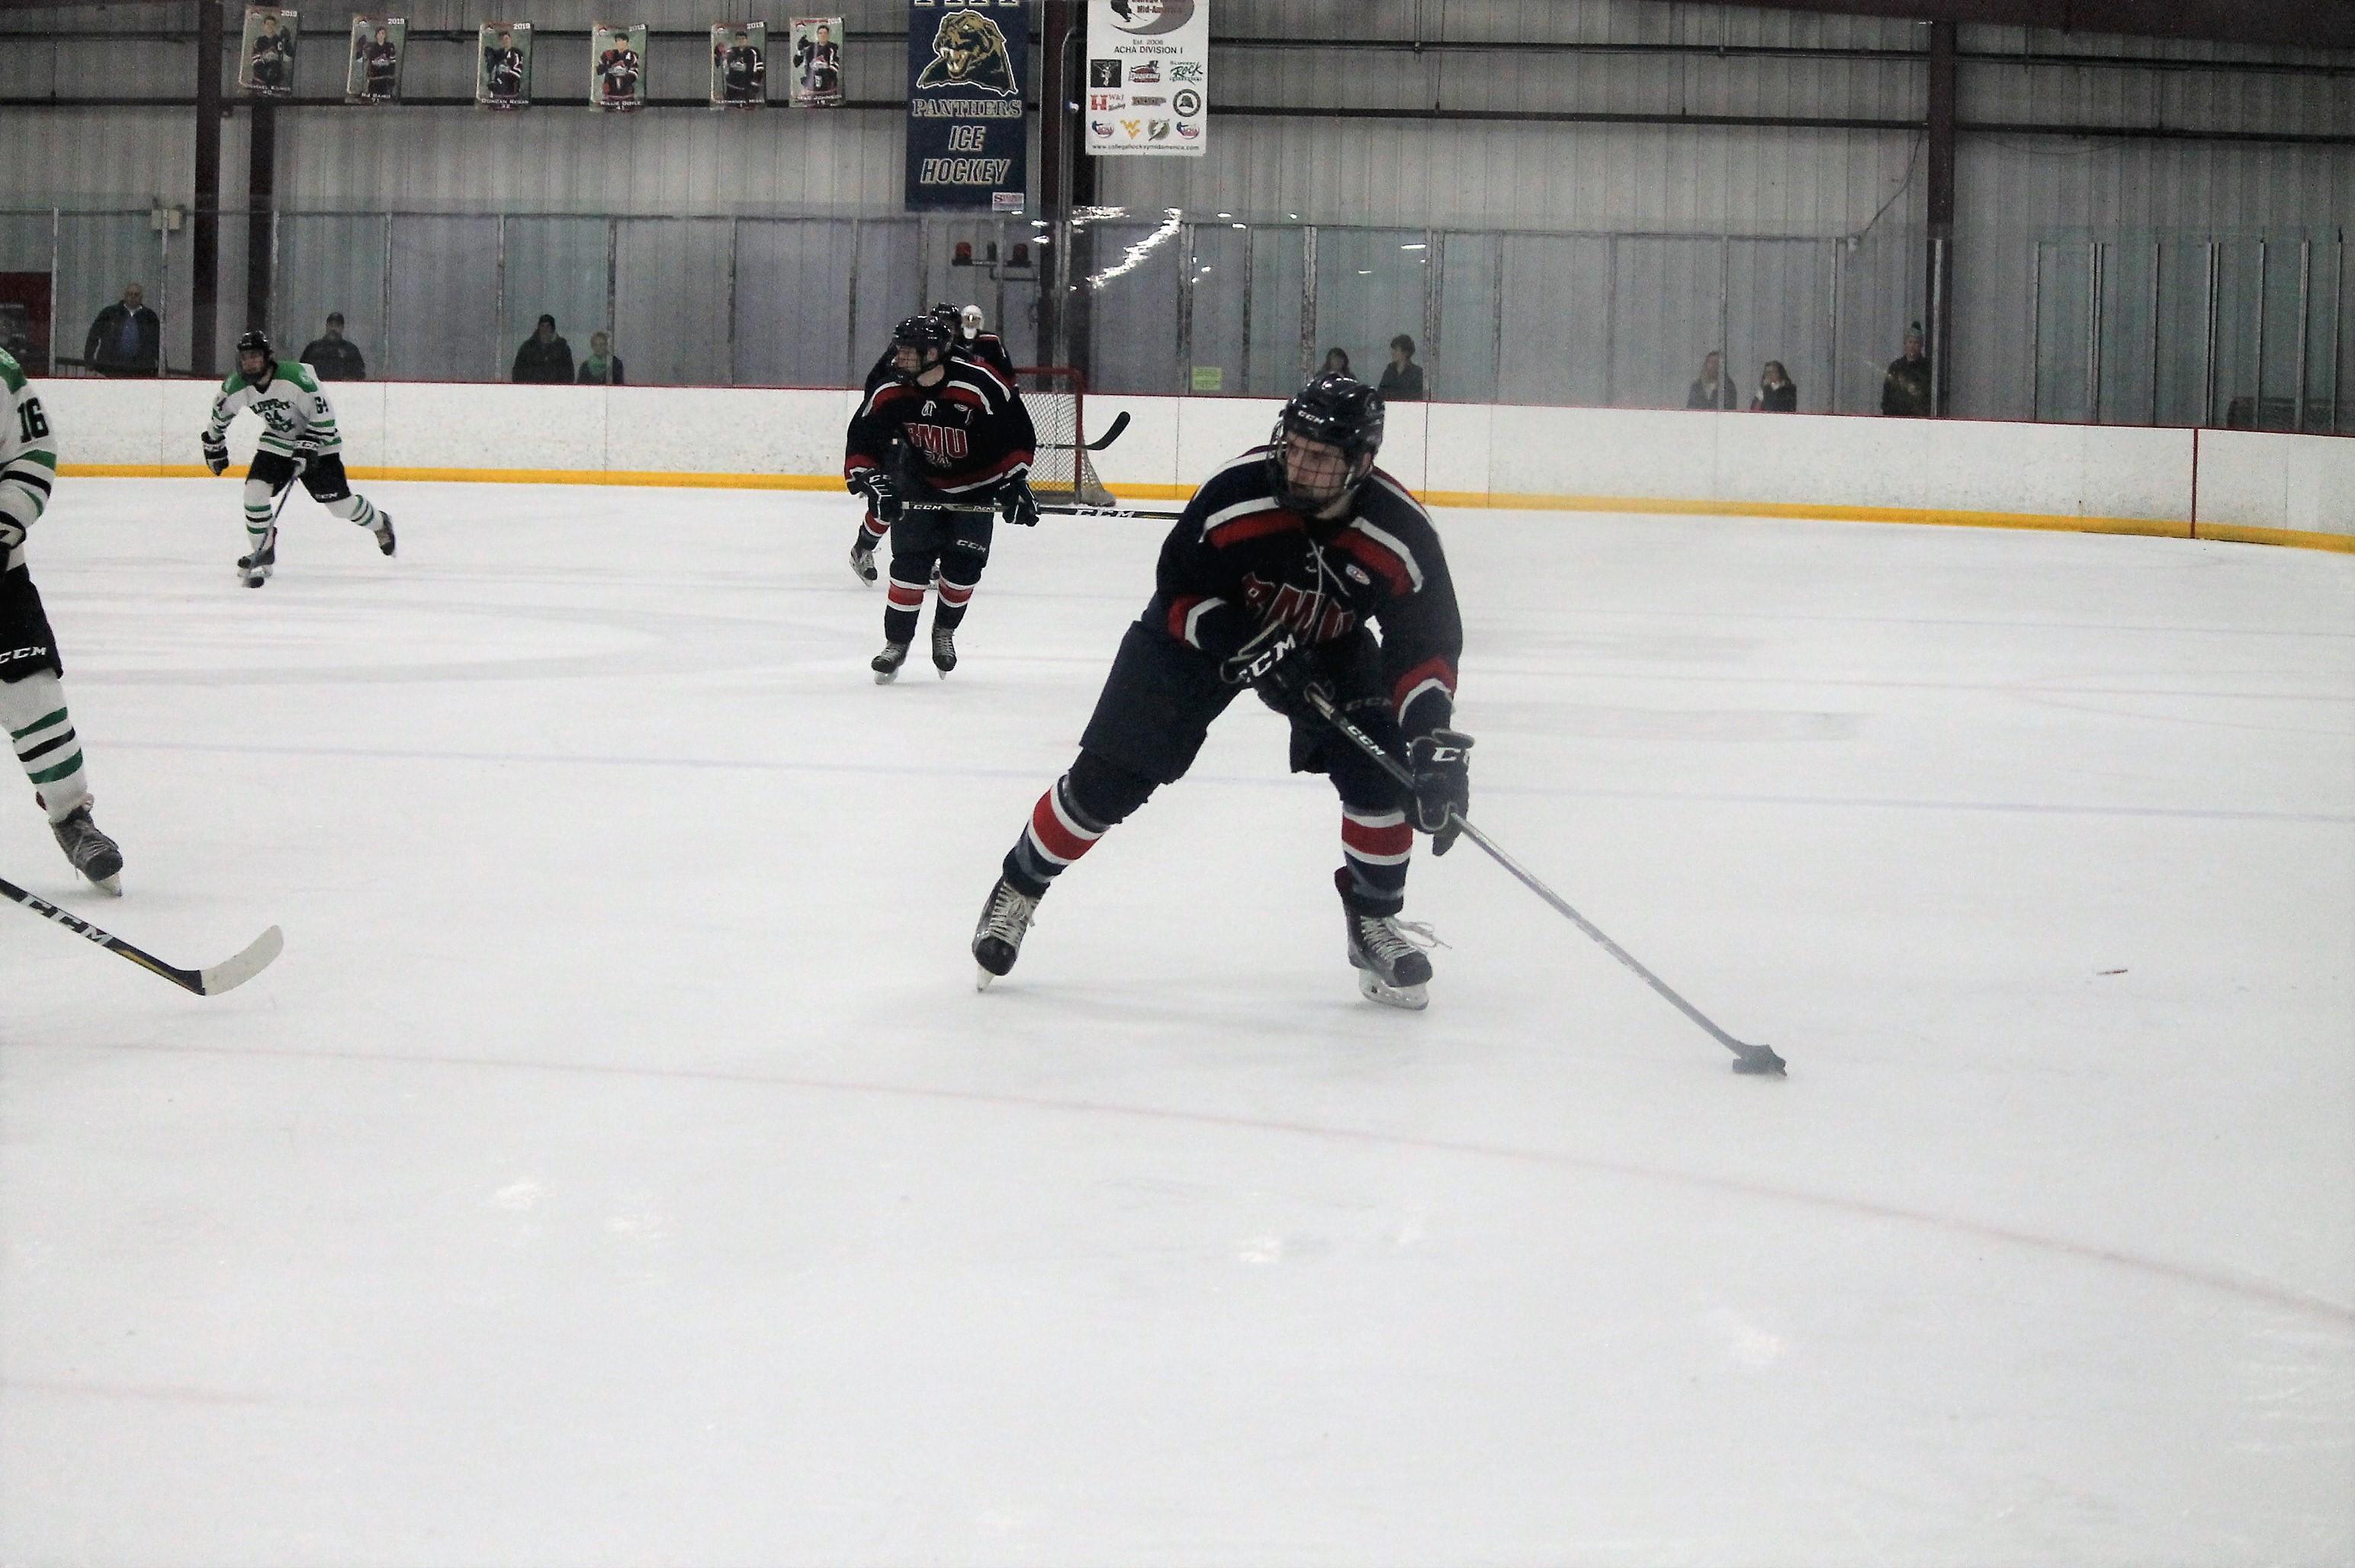 David Roebuck on the ice for Robert Morris University